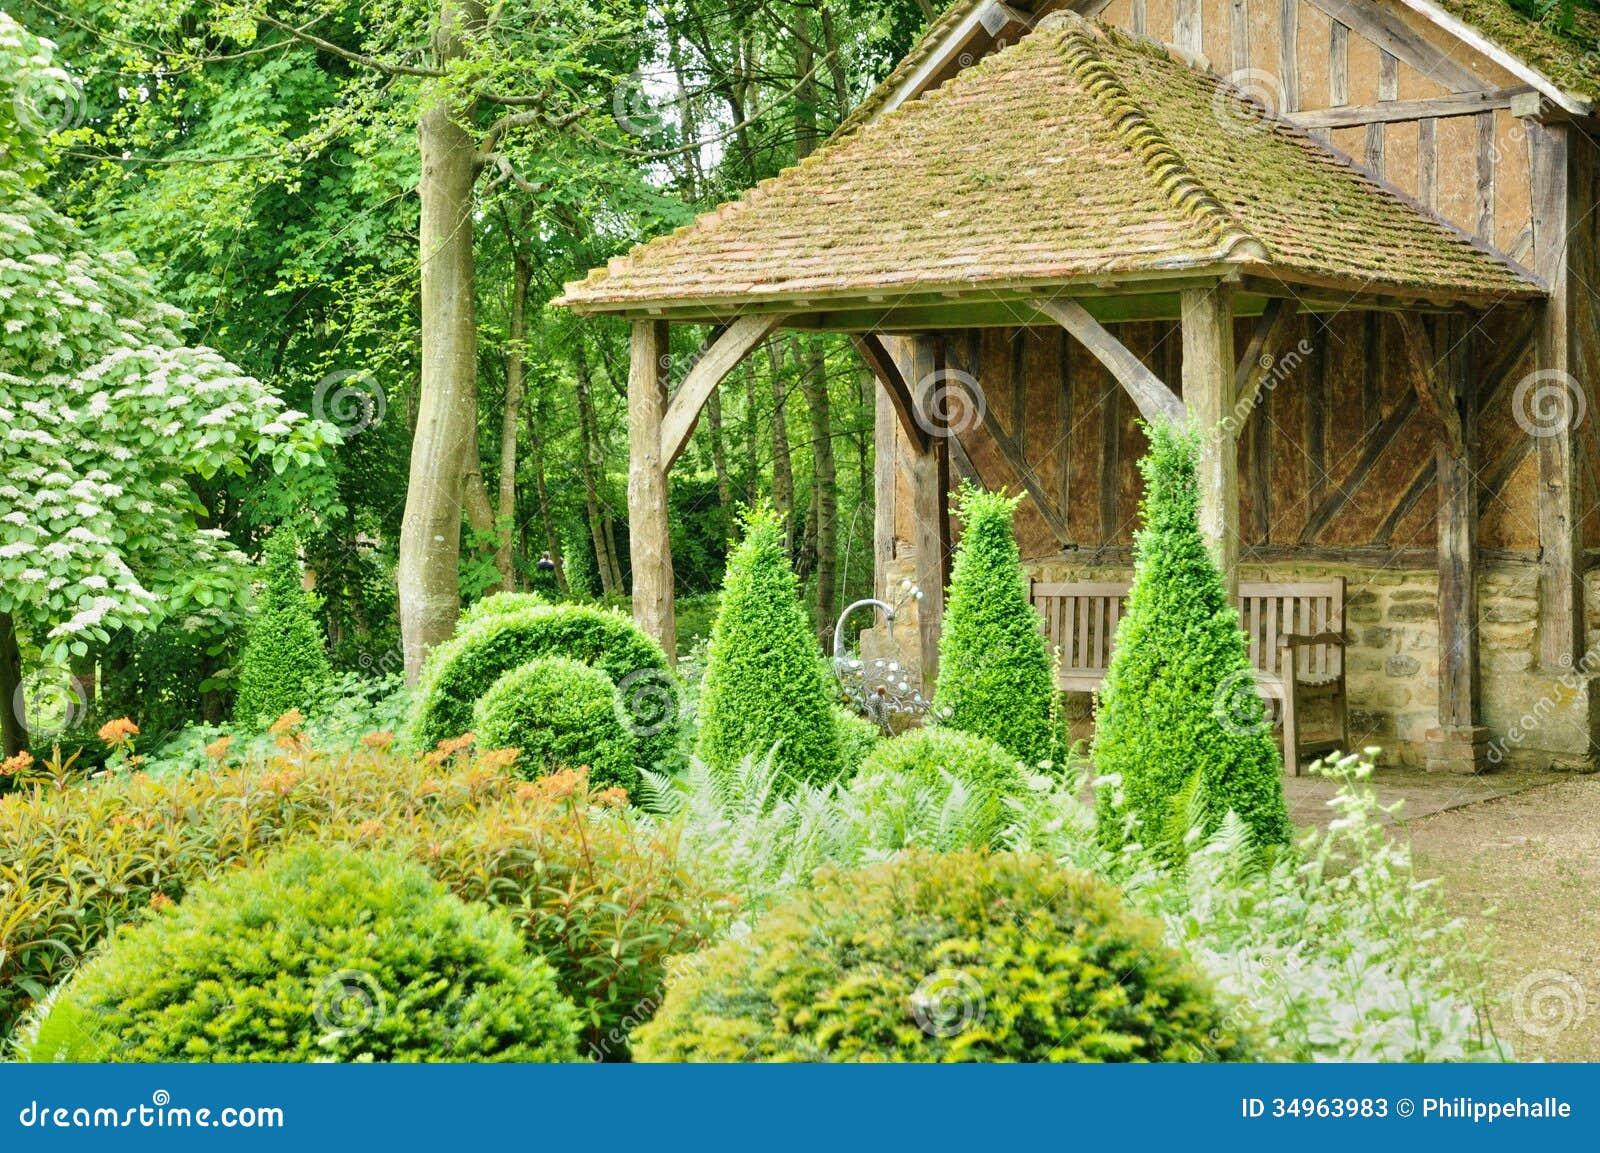 Les jardins du pays d auge in cambremer in normandie stock for Le journal du pays d auge